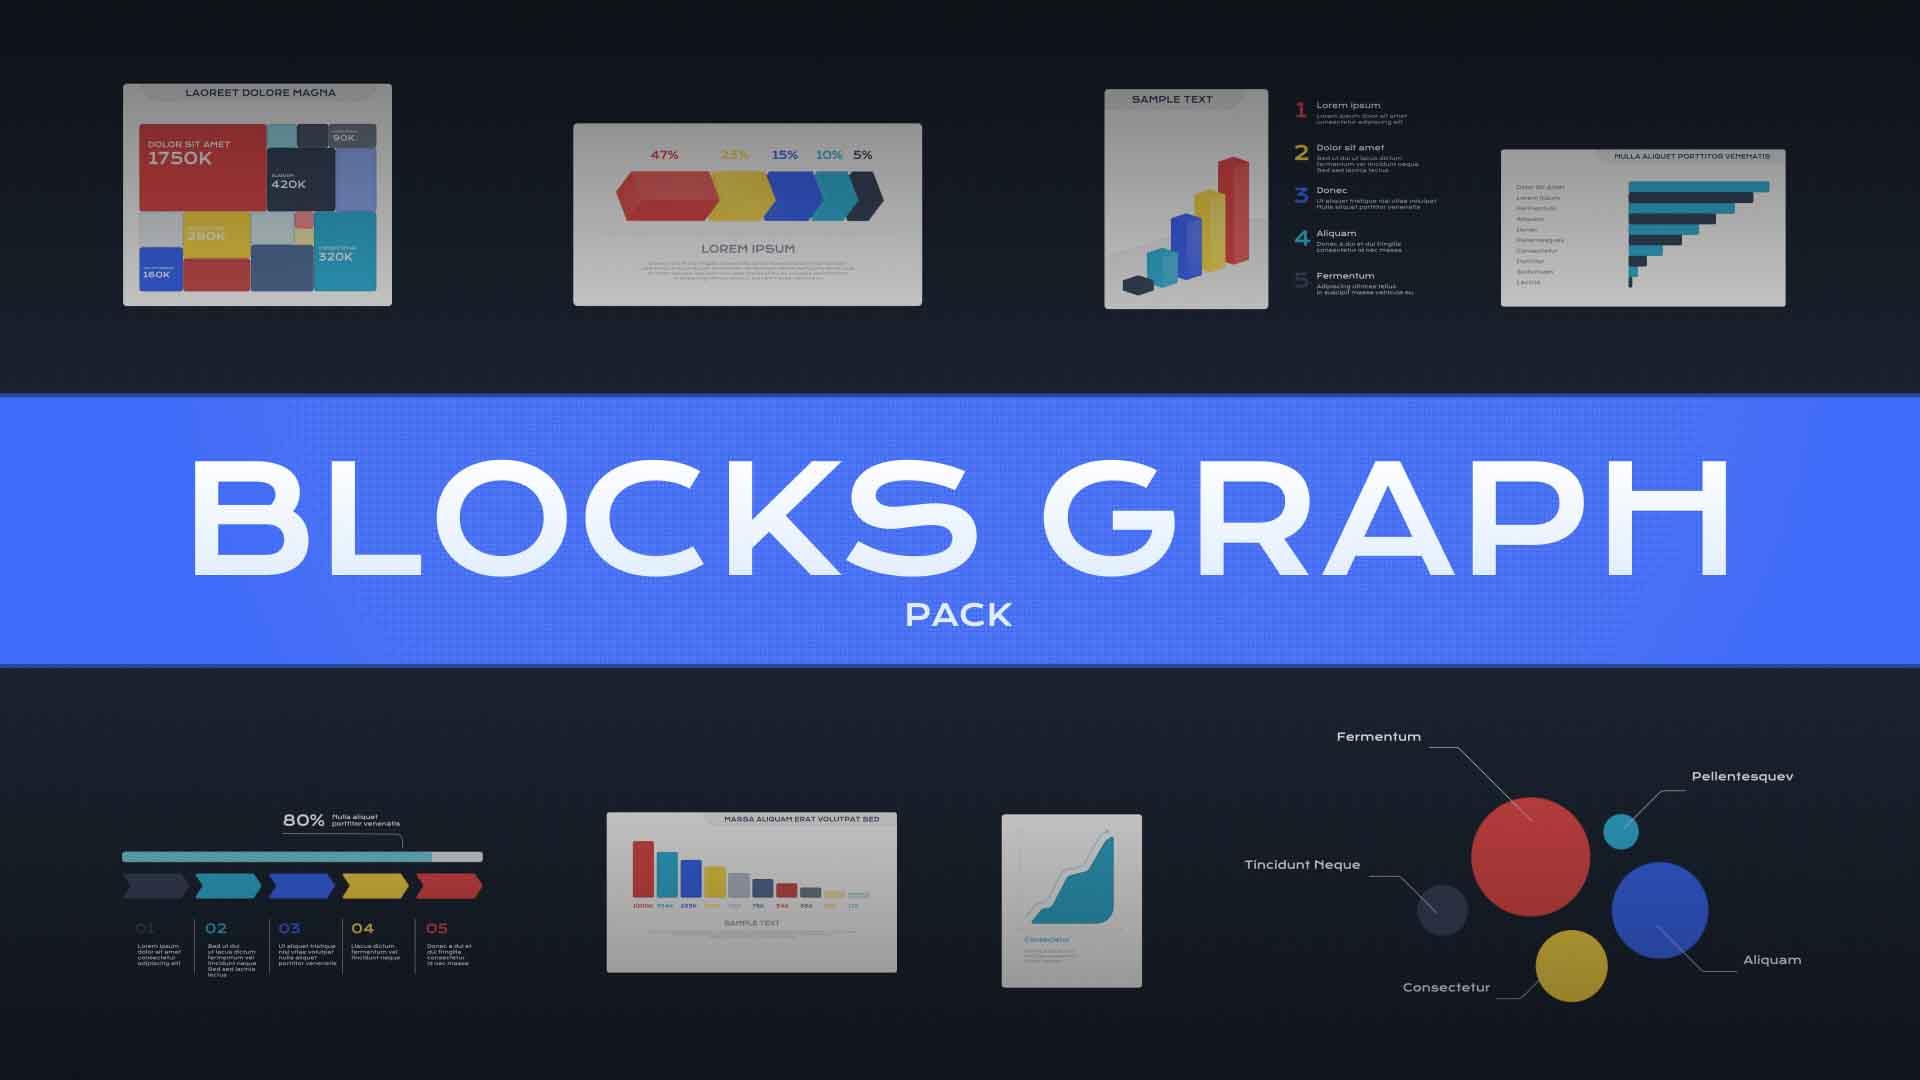 Blocks Graph Pack